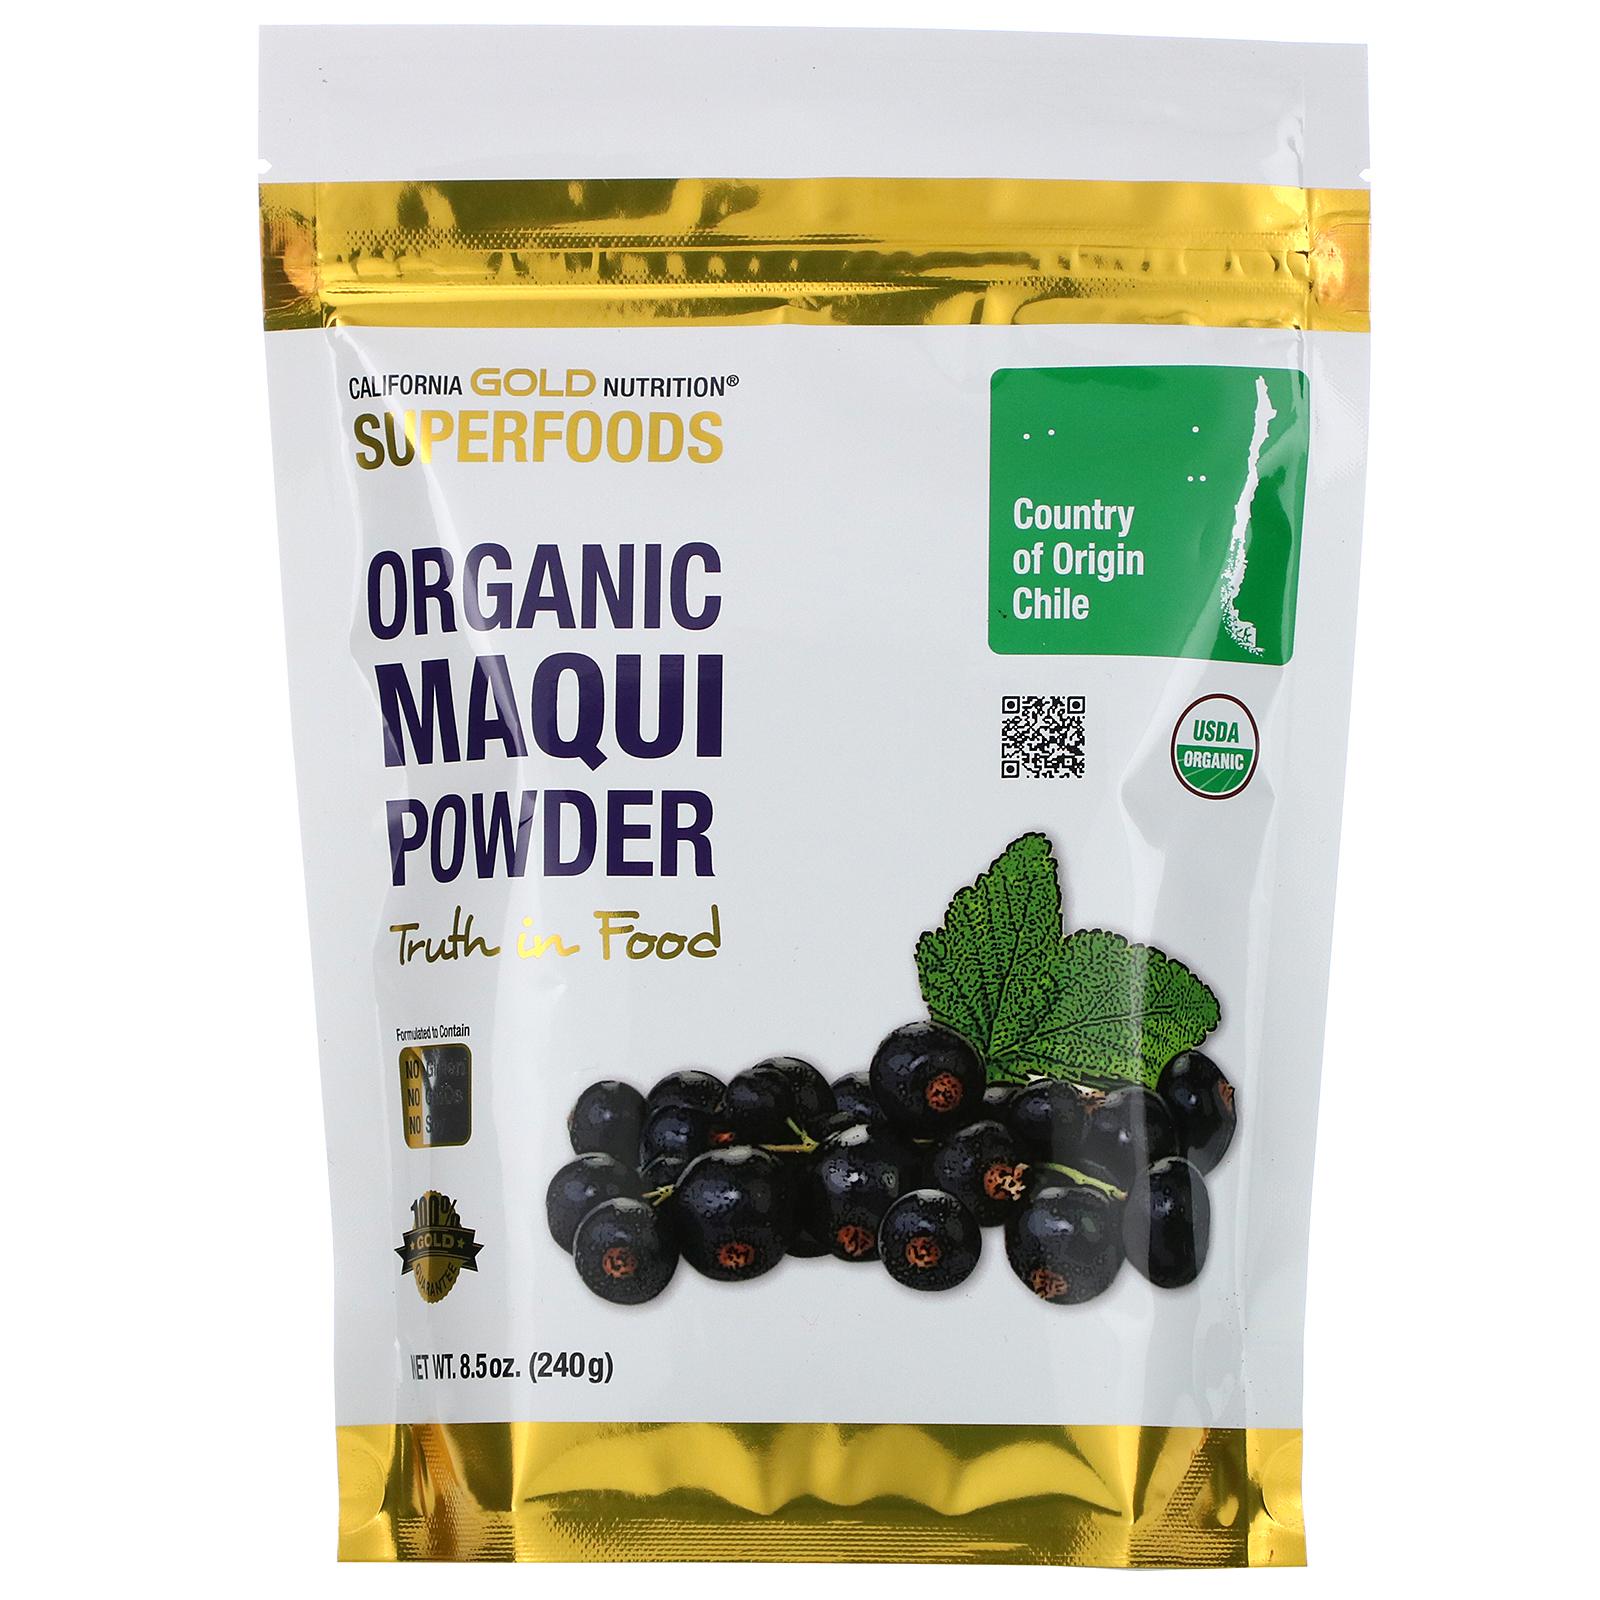 California Gold Nutrition Superfoods Organic Maqui Powder 8 5